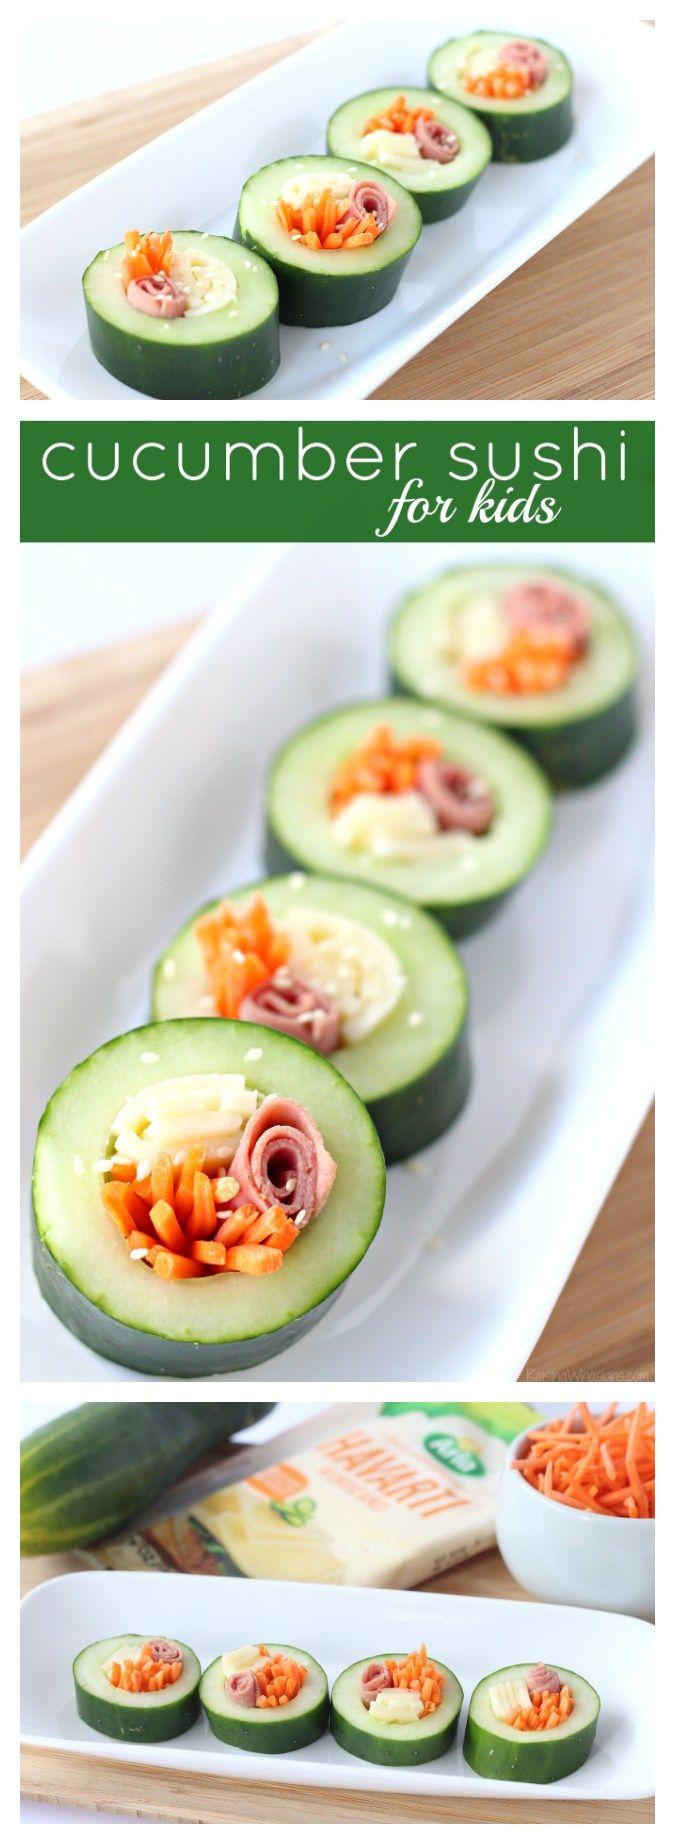 Easy Cucumber Sushi for Kids - Raising Whasians (AD)